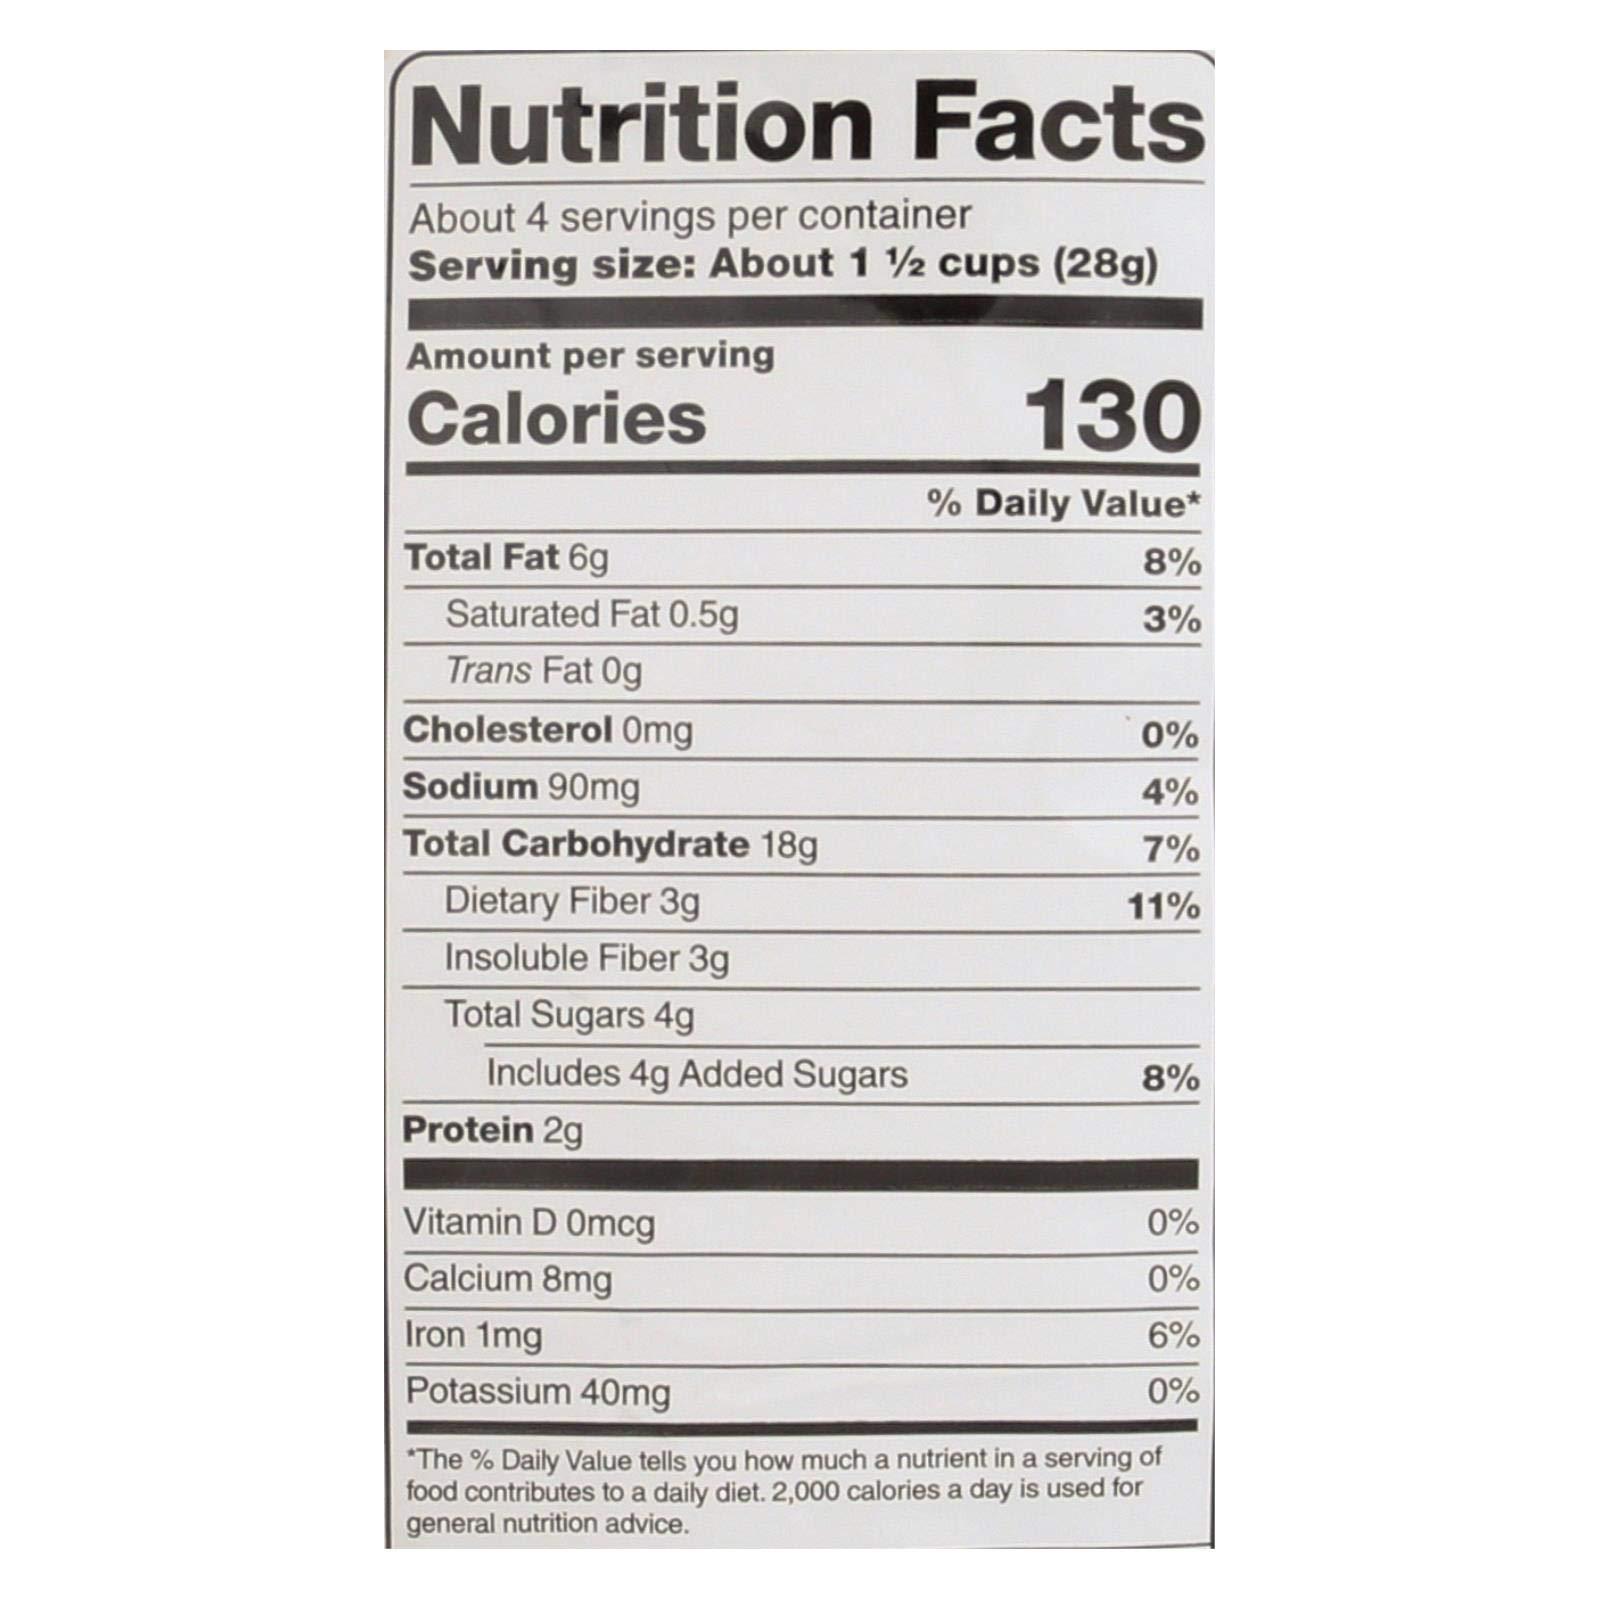 SKINNYPOP POPCORN, PCORN, PUFFS, SWT CINNAMON, Pack of 12, Size 4.2 OZ - No Artificial Ingredients Gluten Free GMO Free Kosher Contains Refined Sugar Vegan by Skinnypop Popcorn (Image #2)